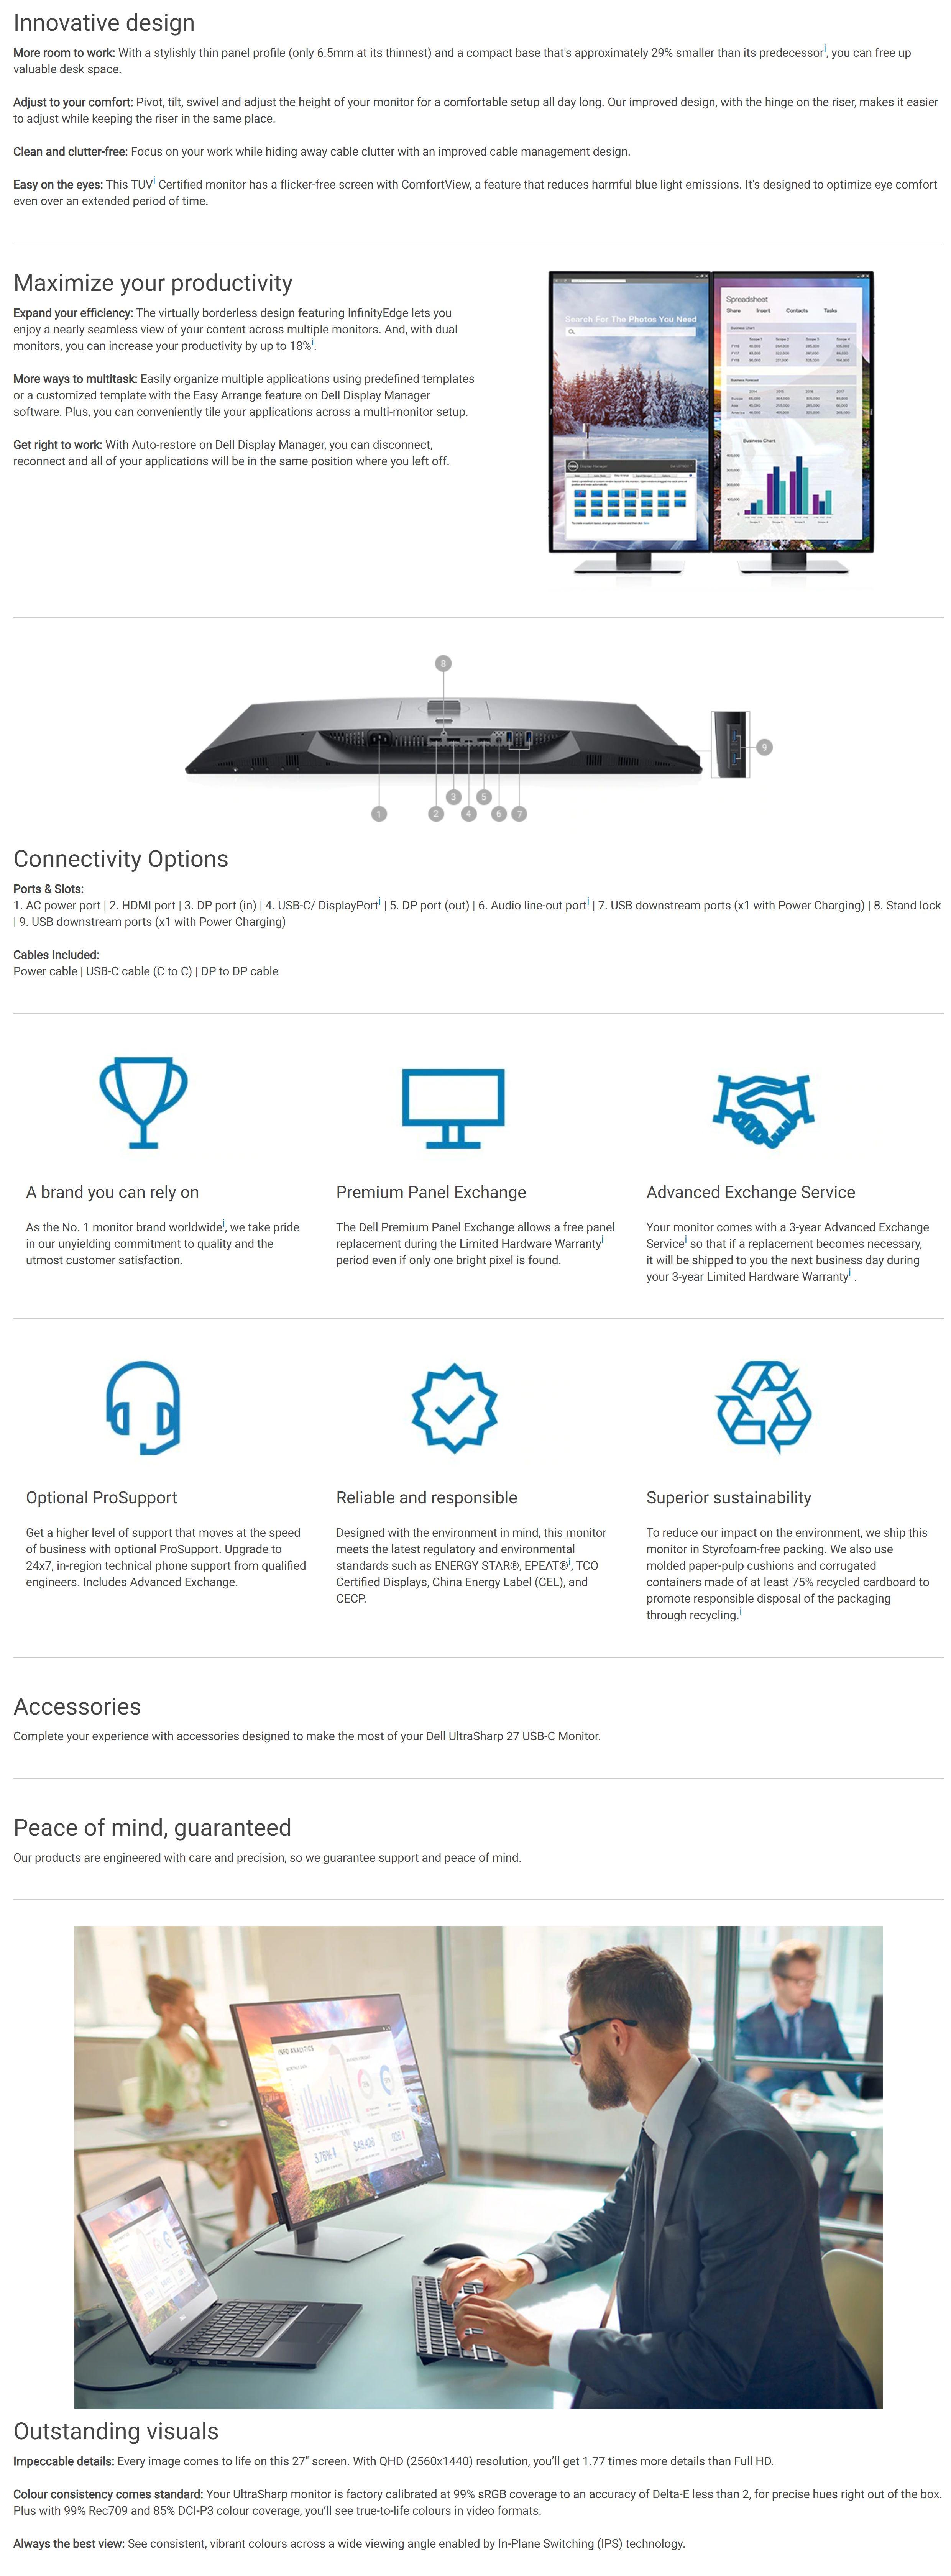 #1488 - 'Dell UltraSharp 27 USB-C Monitor_ U2719DC I Dell Australia' - www_dell_com.jpg